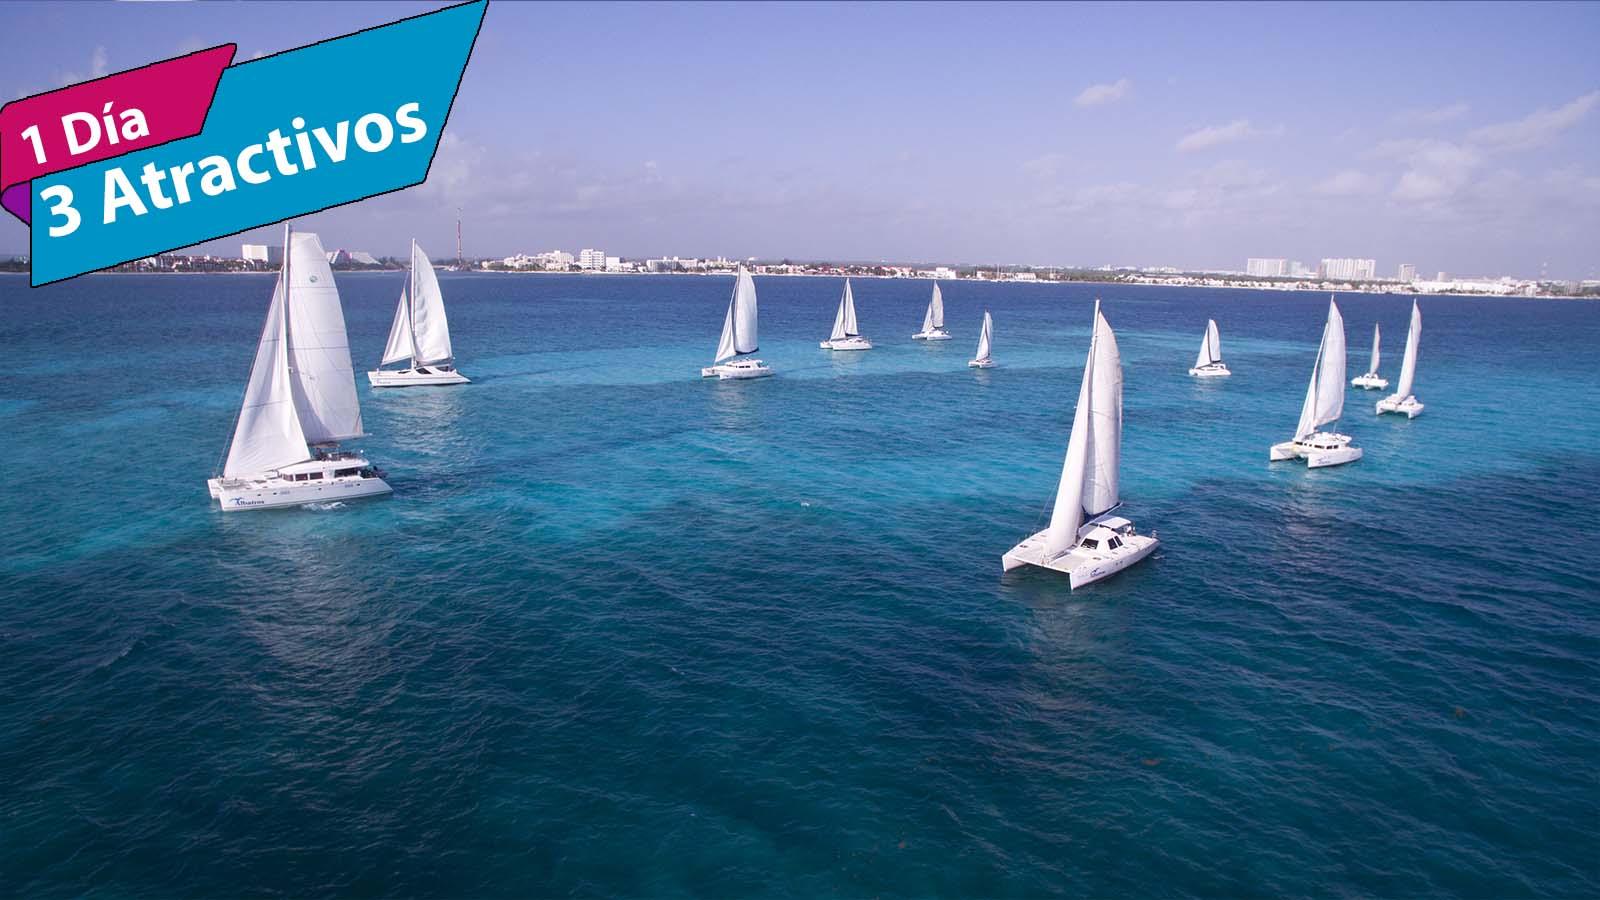 Tour Isla Mujeres en Catamarán sin transportación